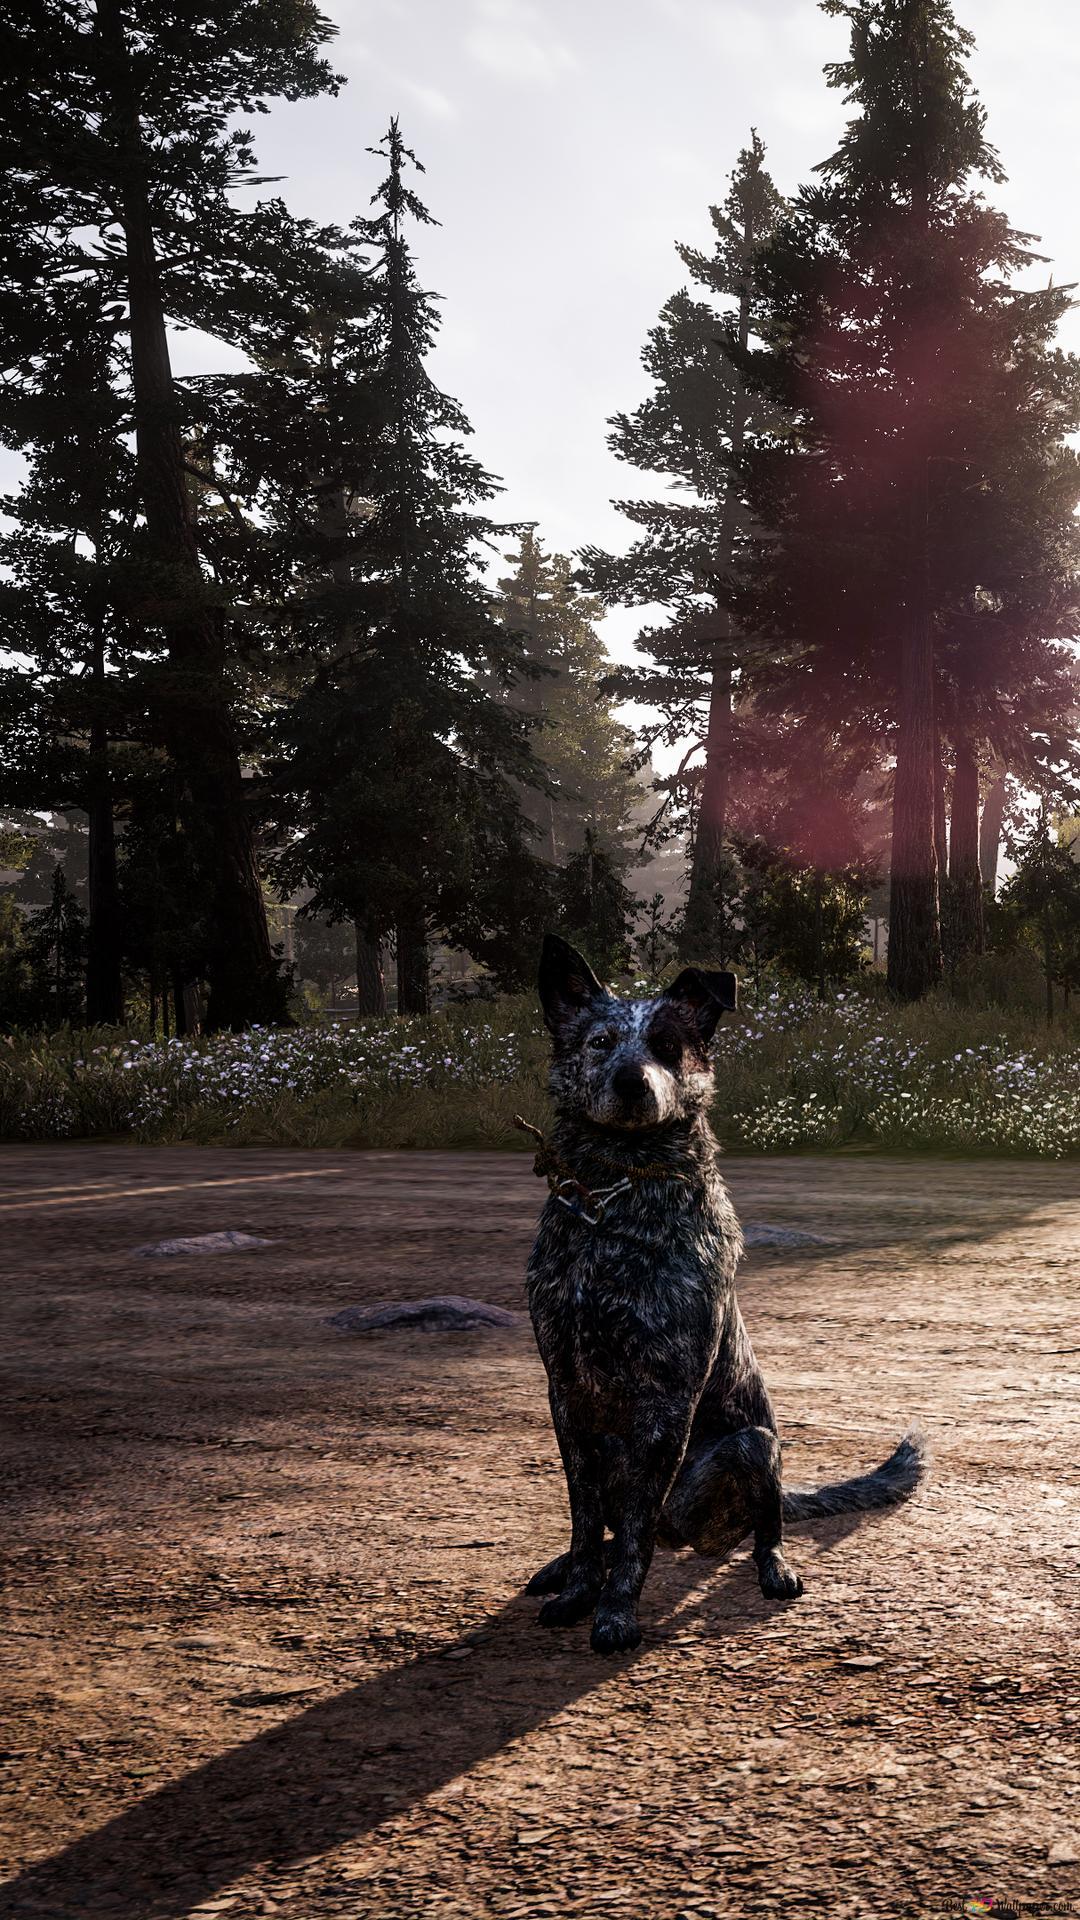 Far Cry 5 The Platters A Loyal Friend Hd Wallpaper Download